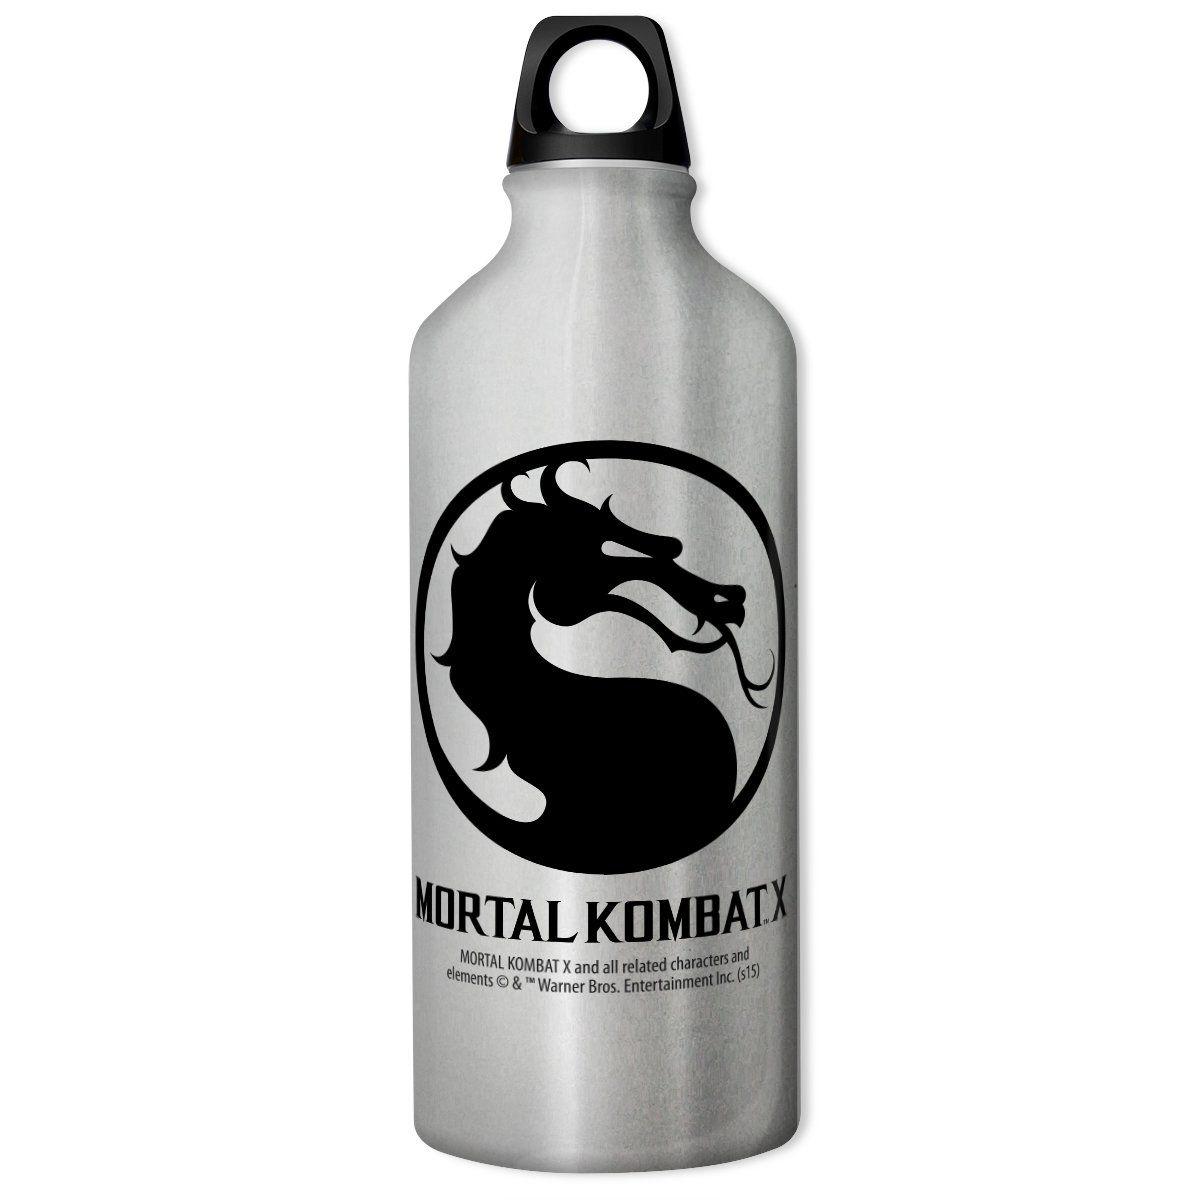 Squeeze Mortal Kombat X Logo  - bandUP Store Marketplace